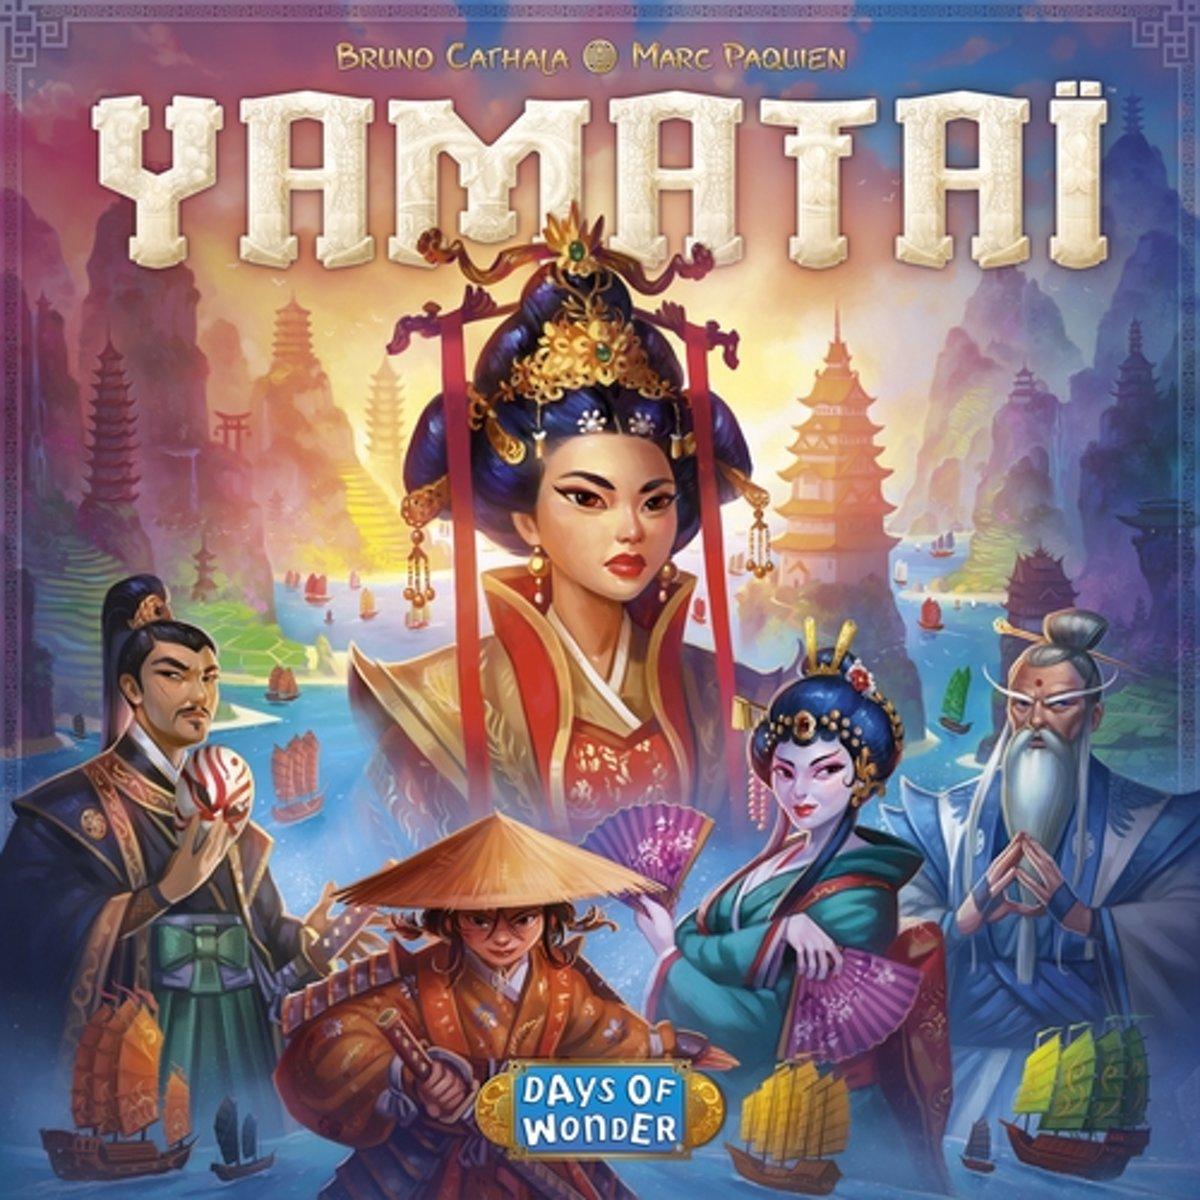 Yamatai Bordspel - Engelstalig